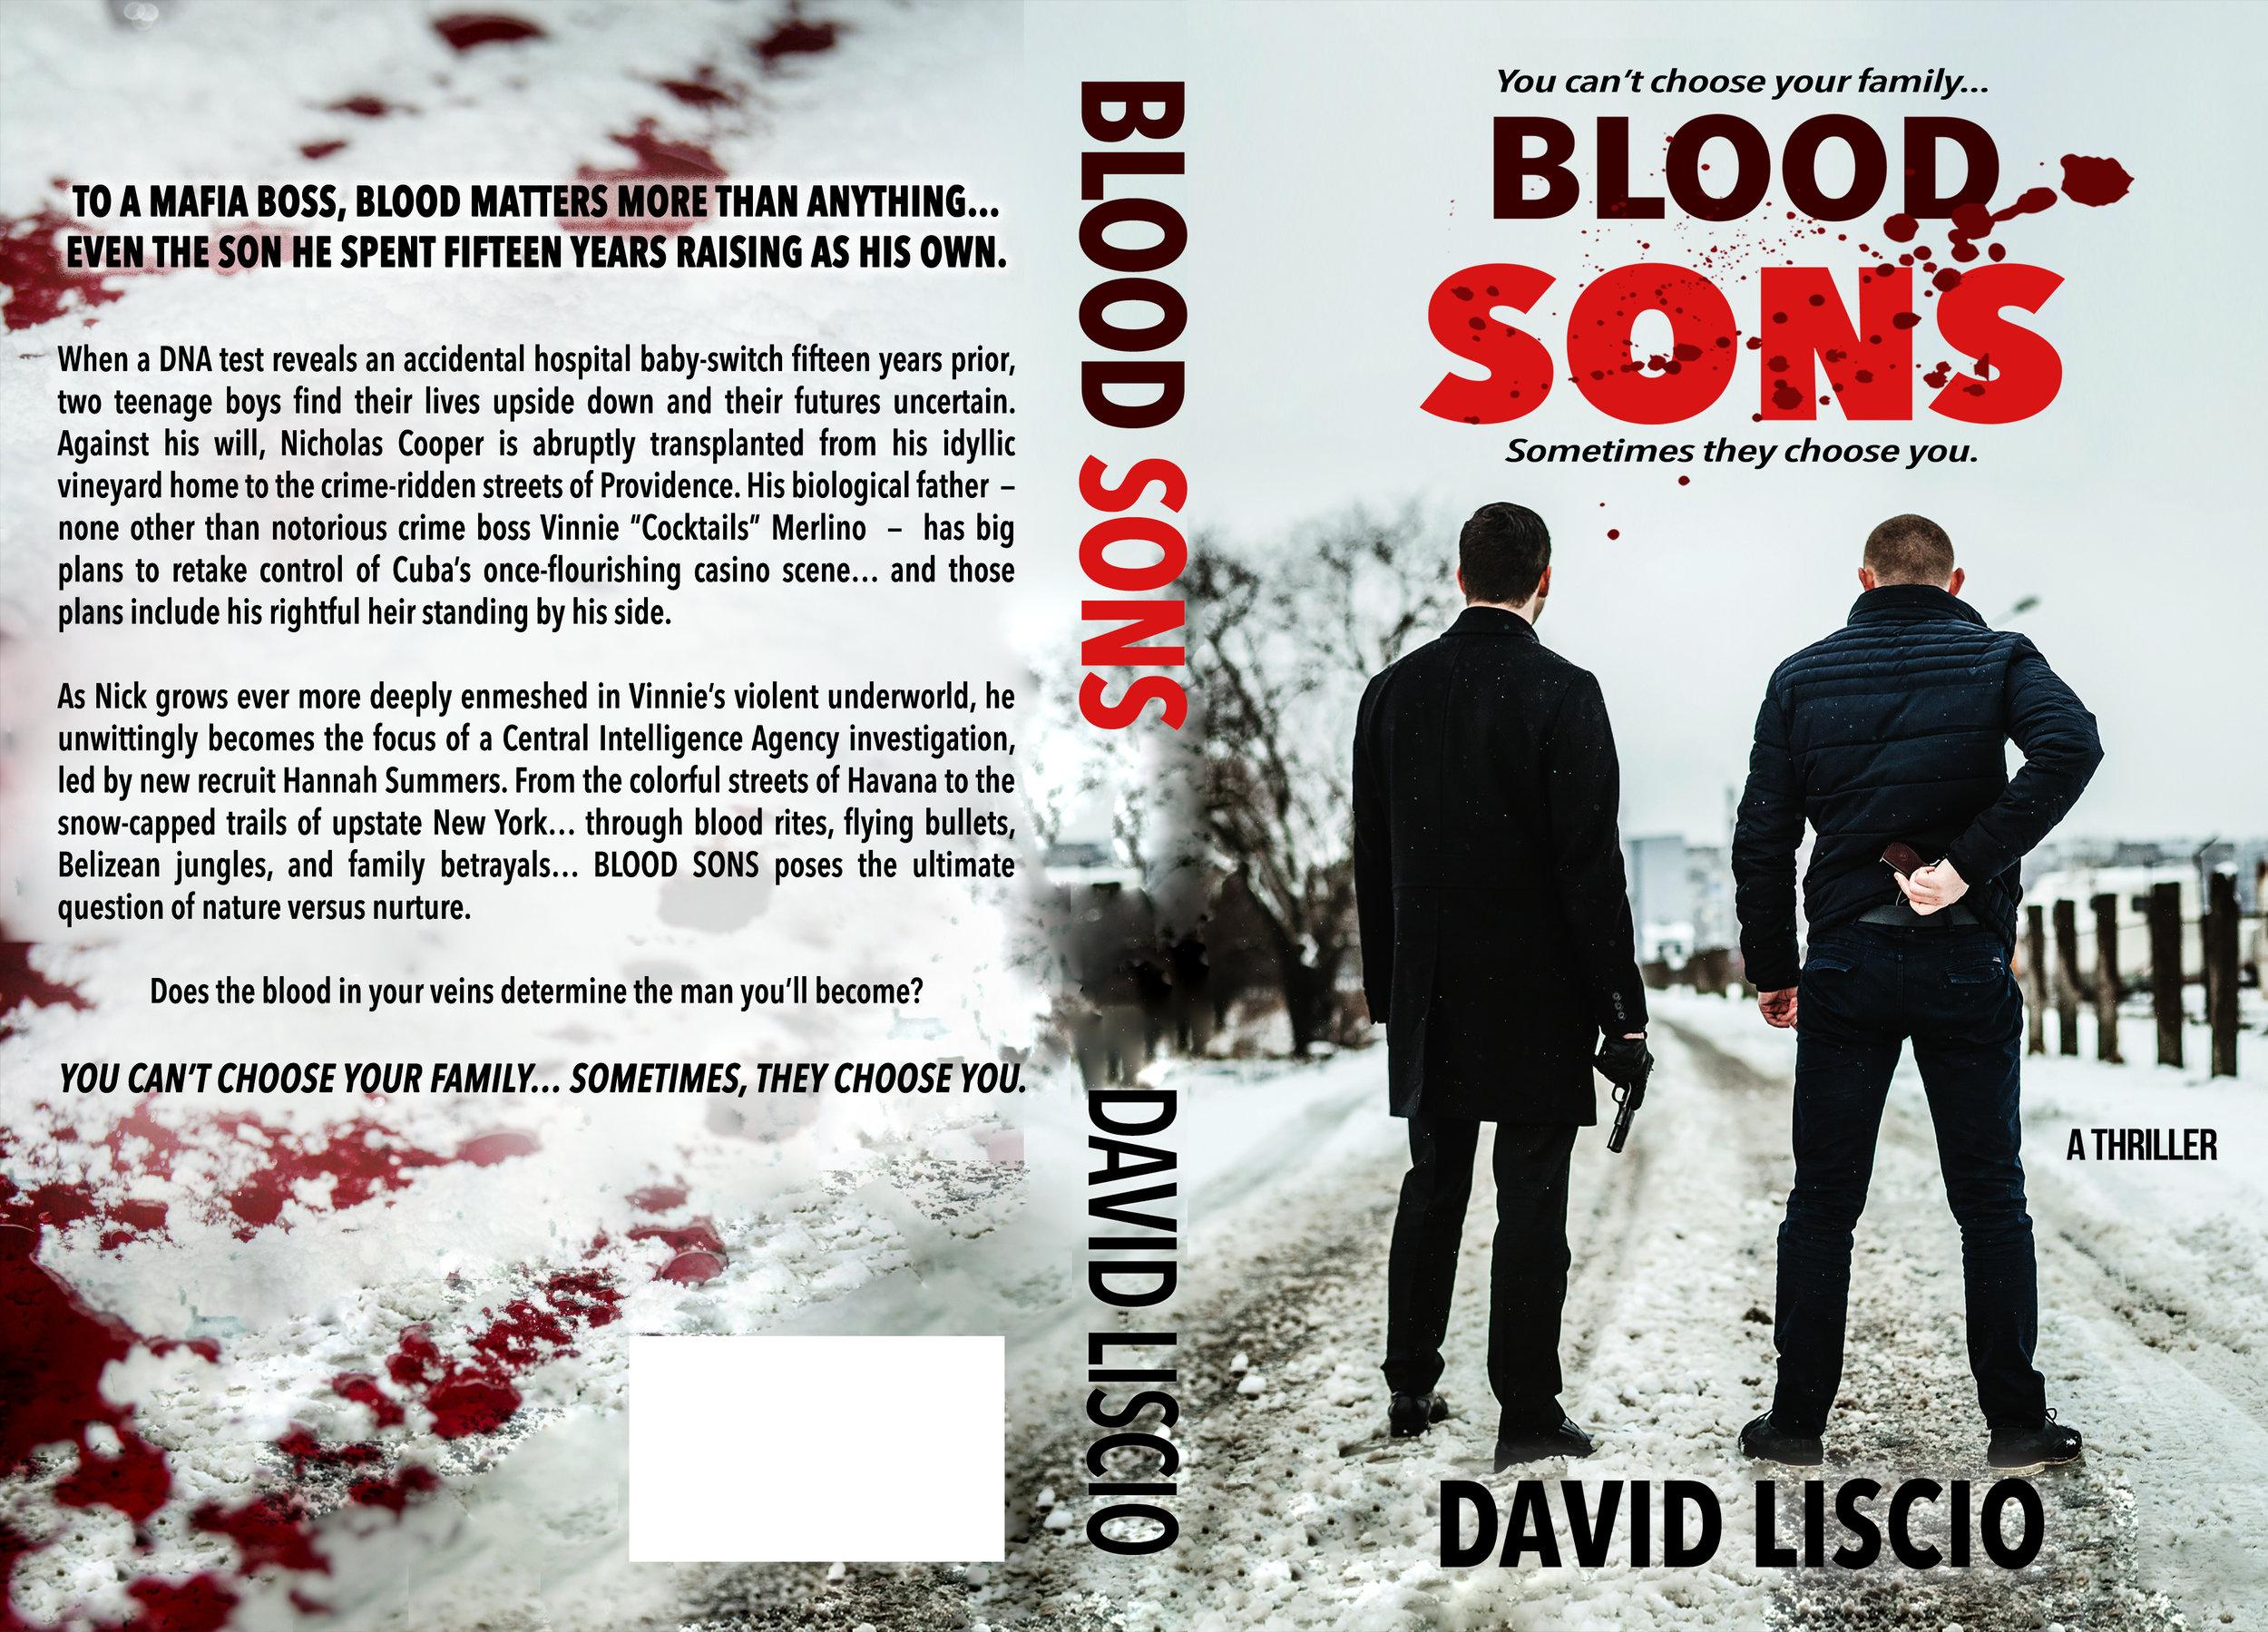 blood sons book jacket spread.jpg